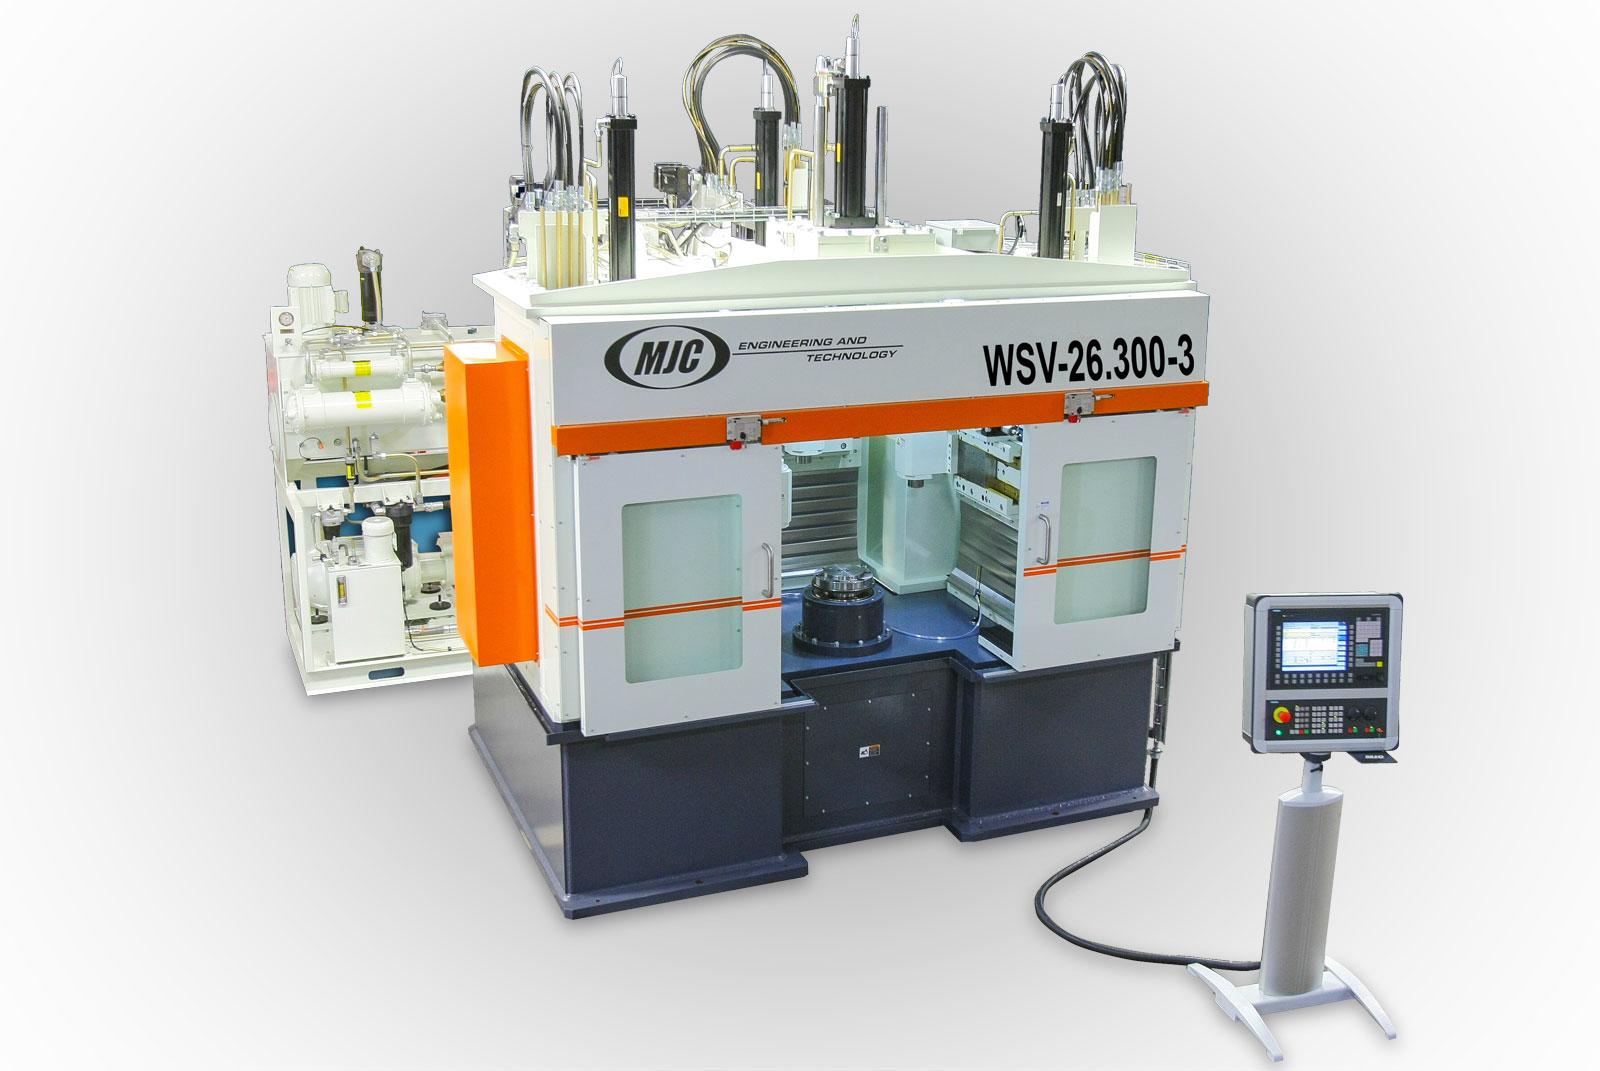 MJC WSV-26.300-3